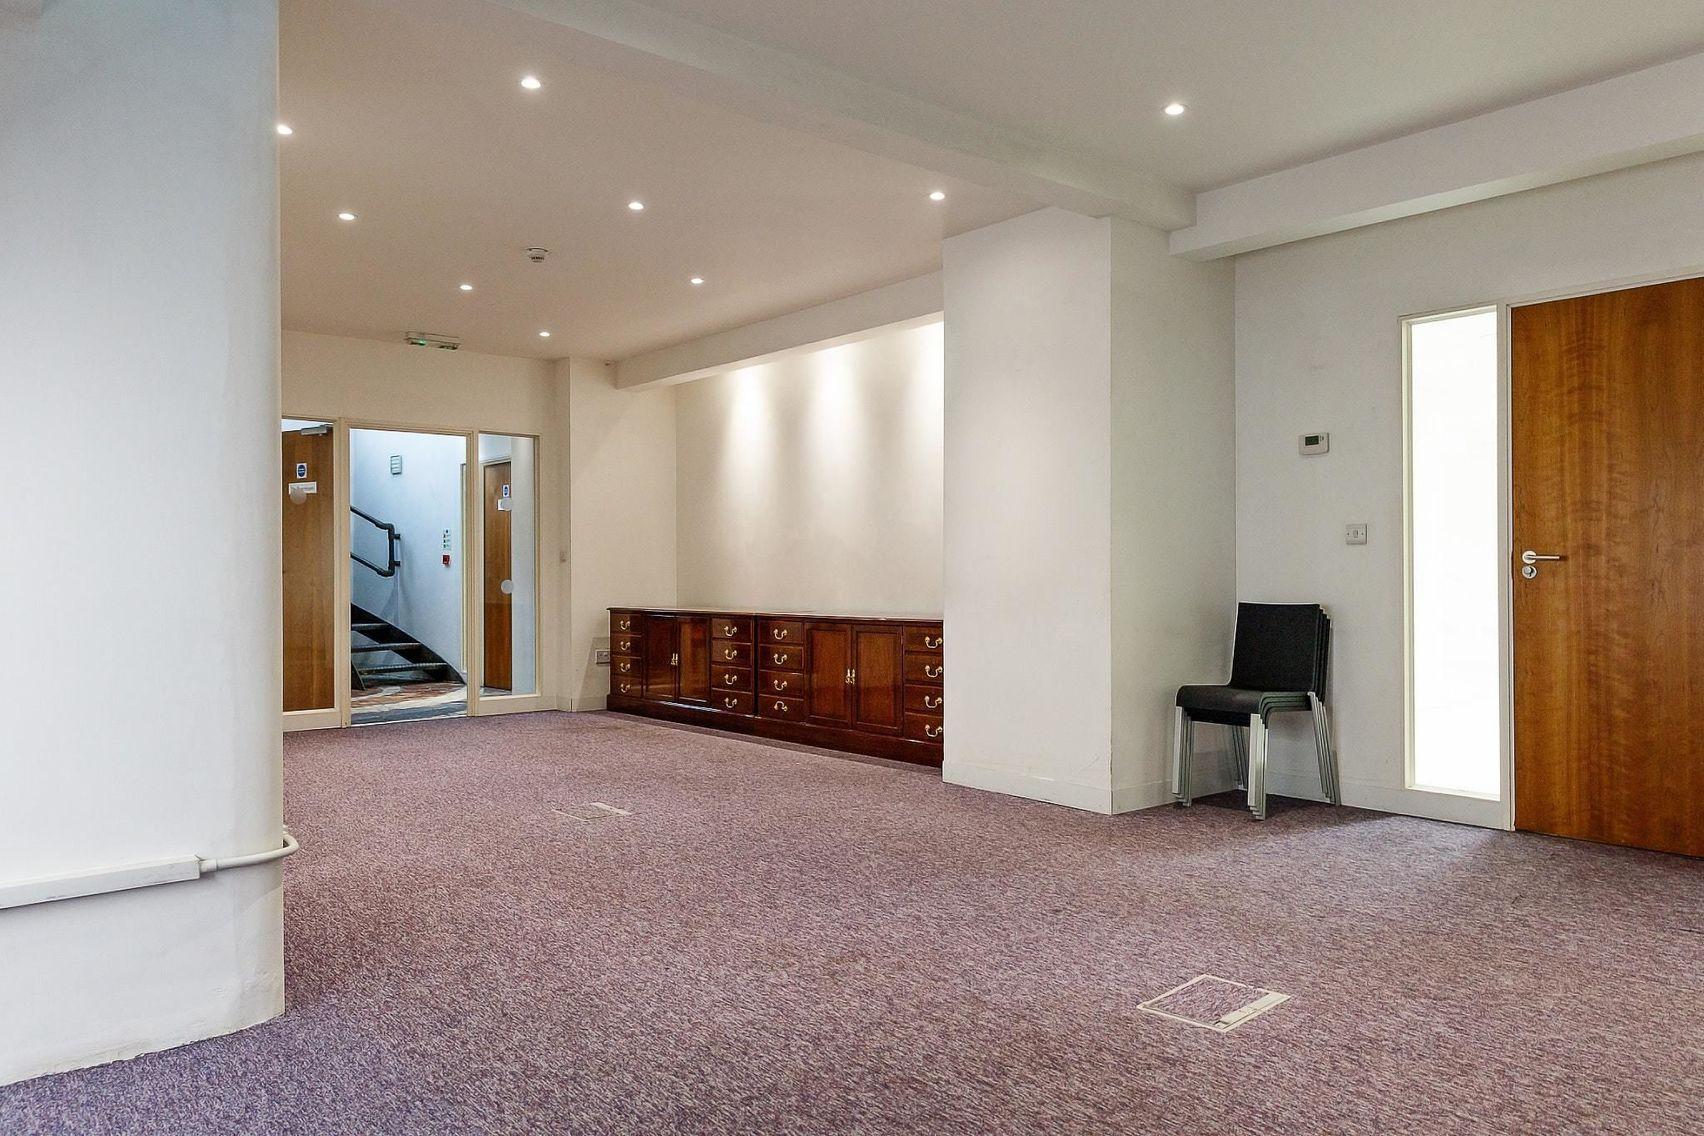 The Long Room, Eastside Educational Trust